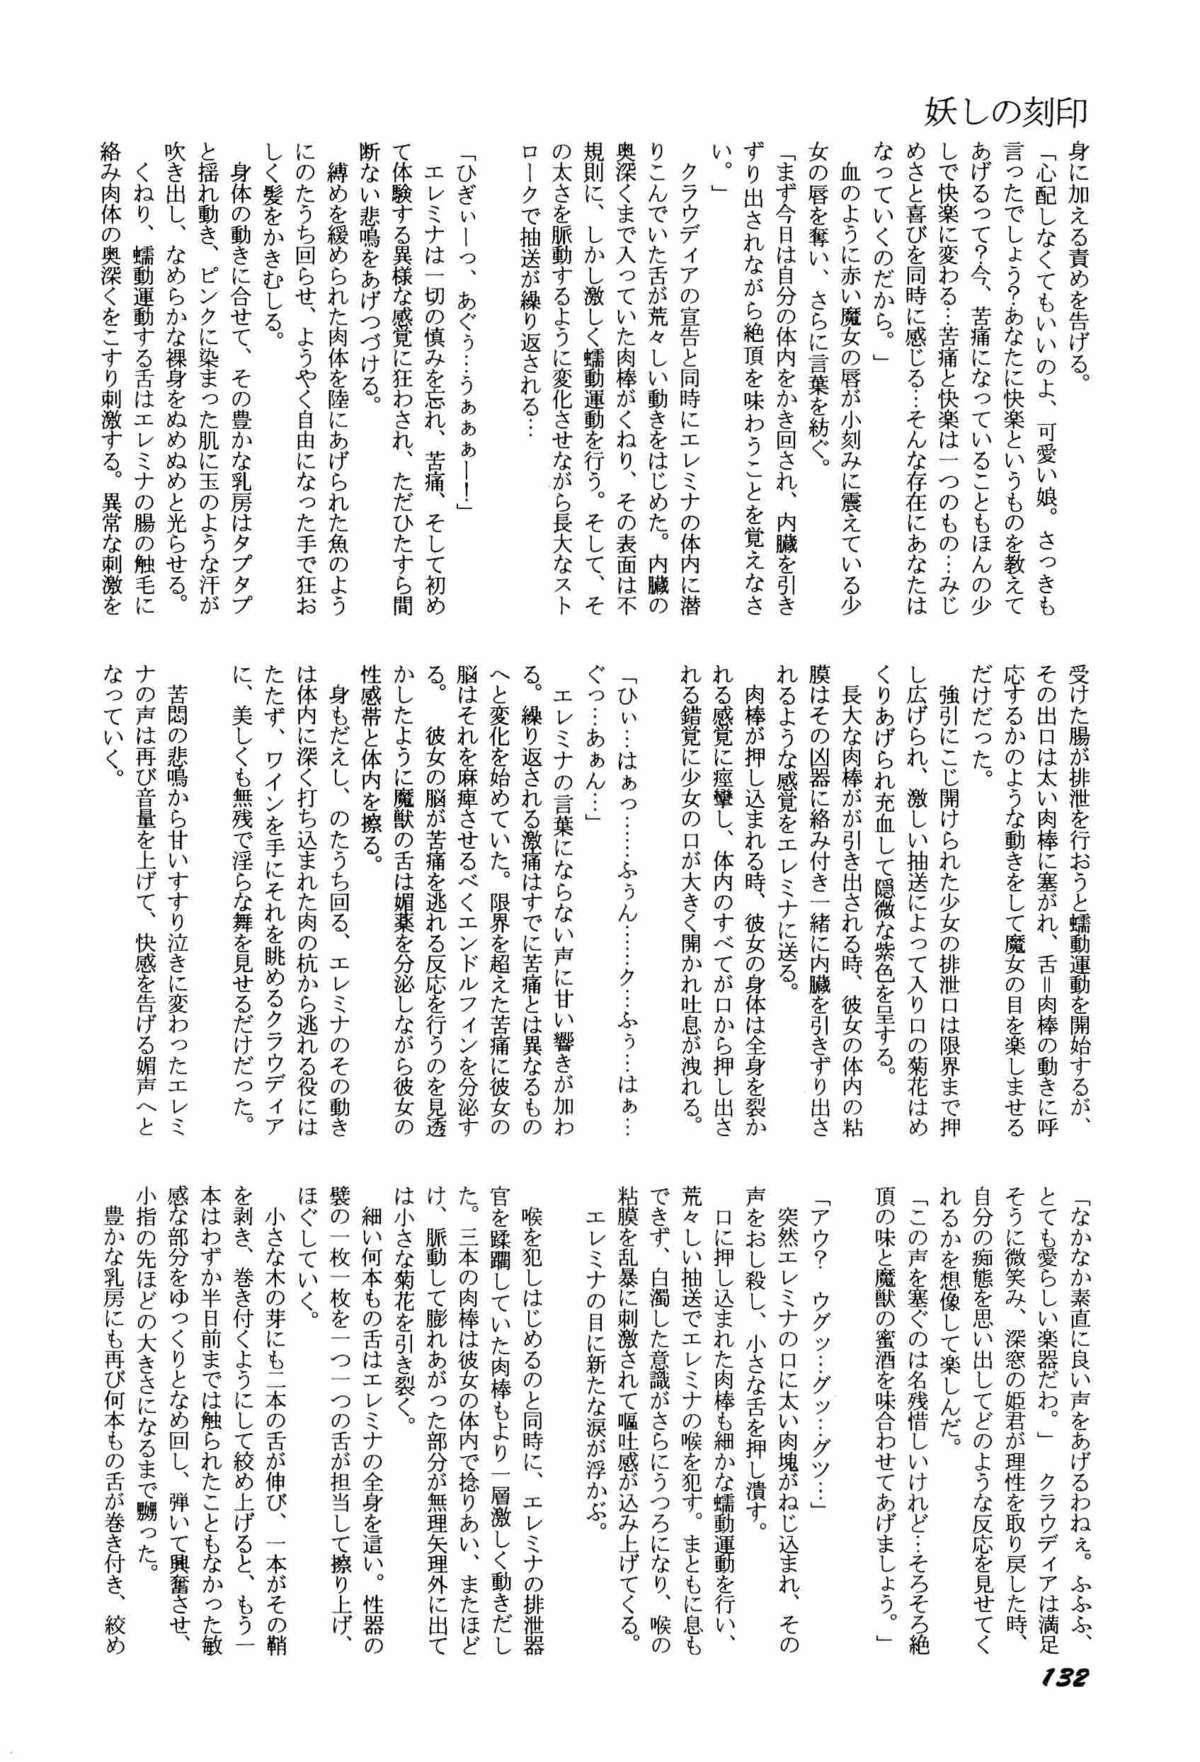 Bisyoujo Anthology '93 jyoukan 134